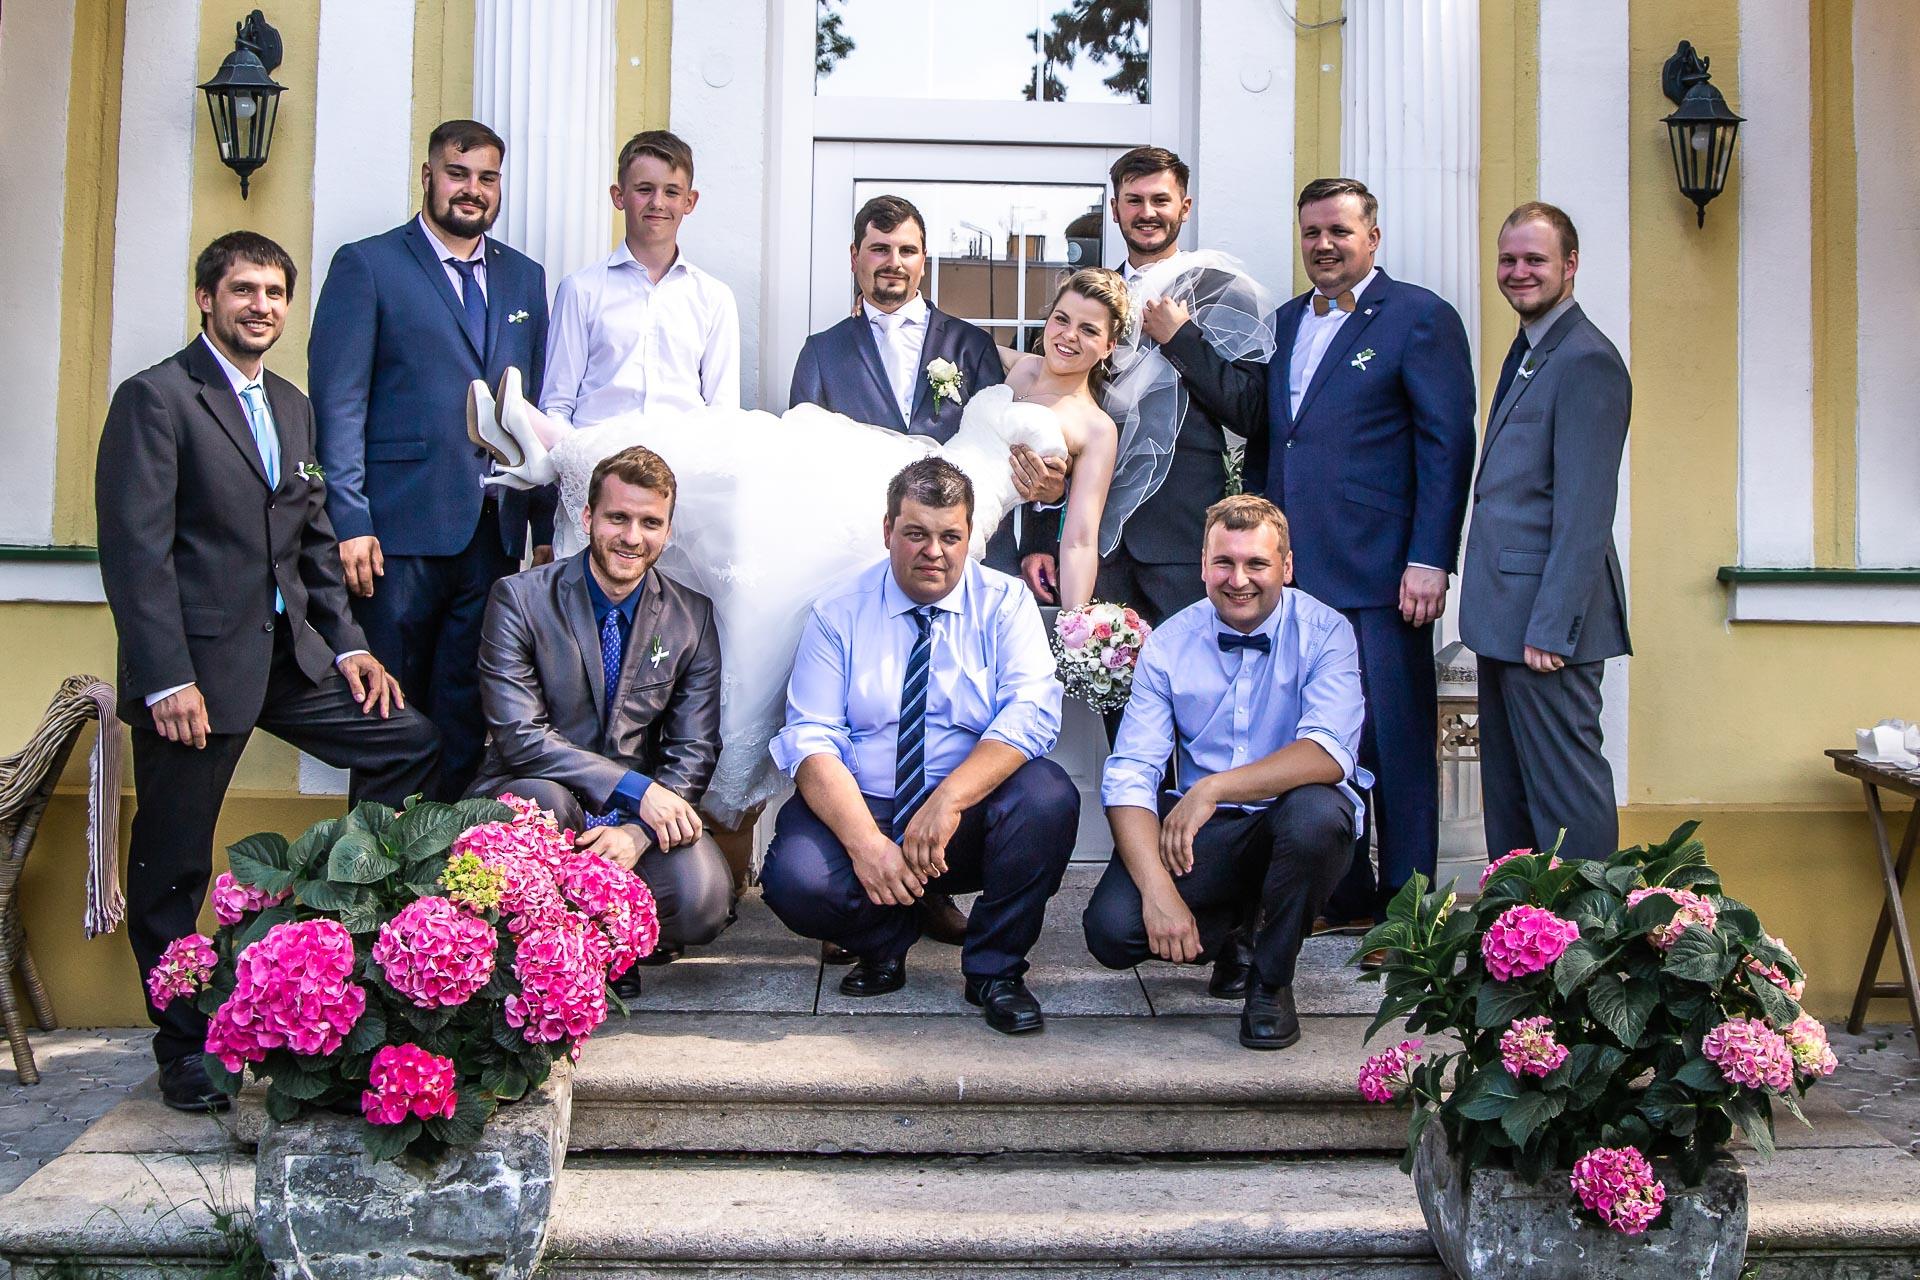 Svatební-fotograf-Nymburk-5891